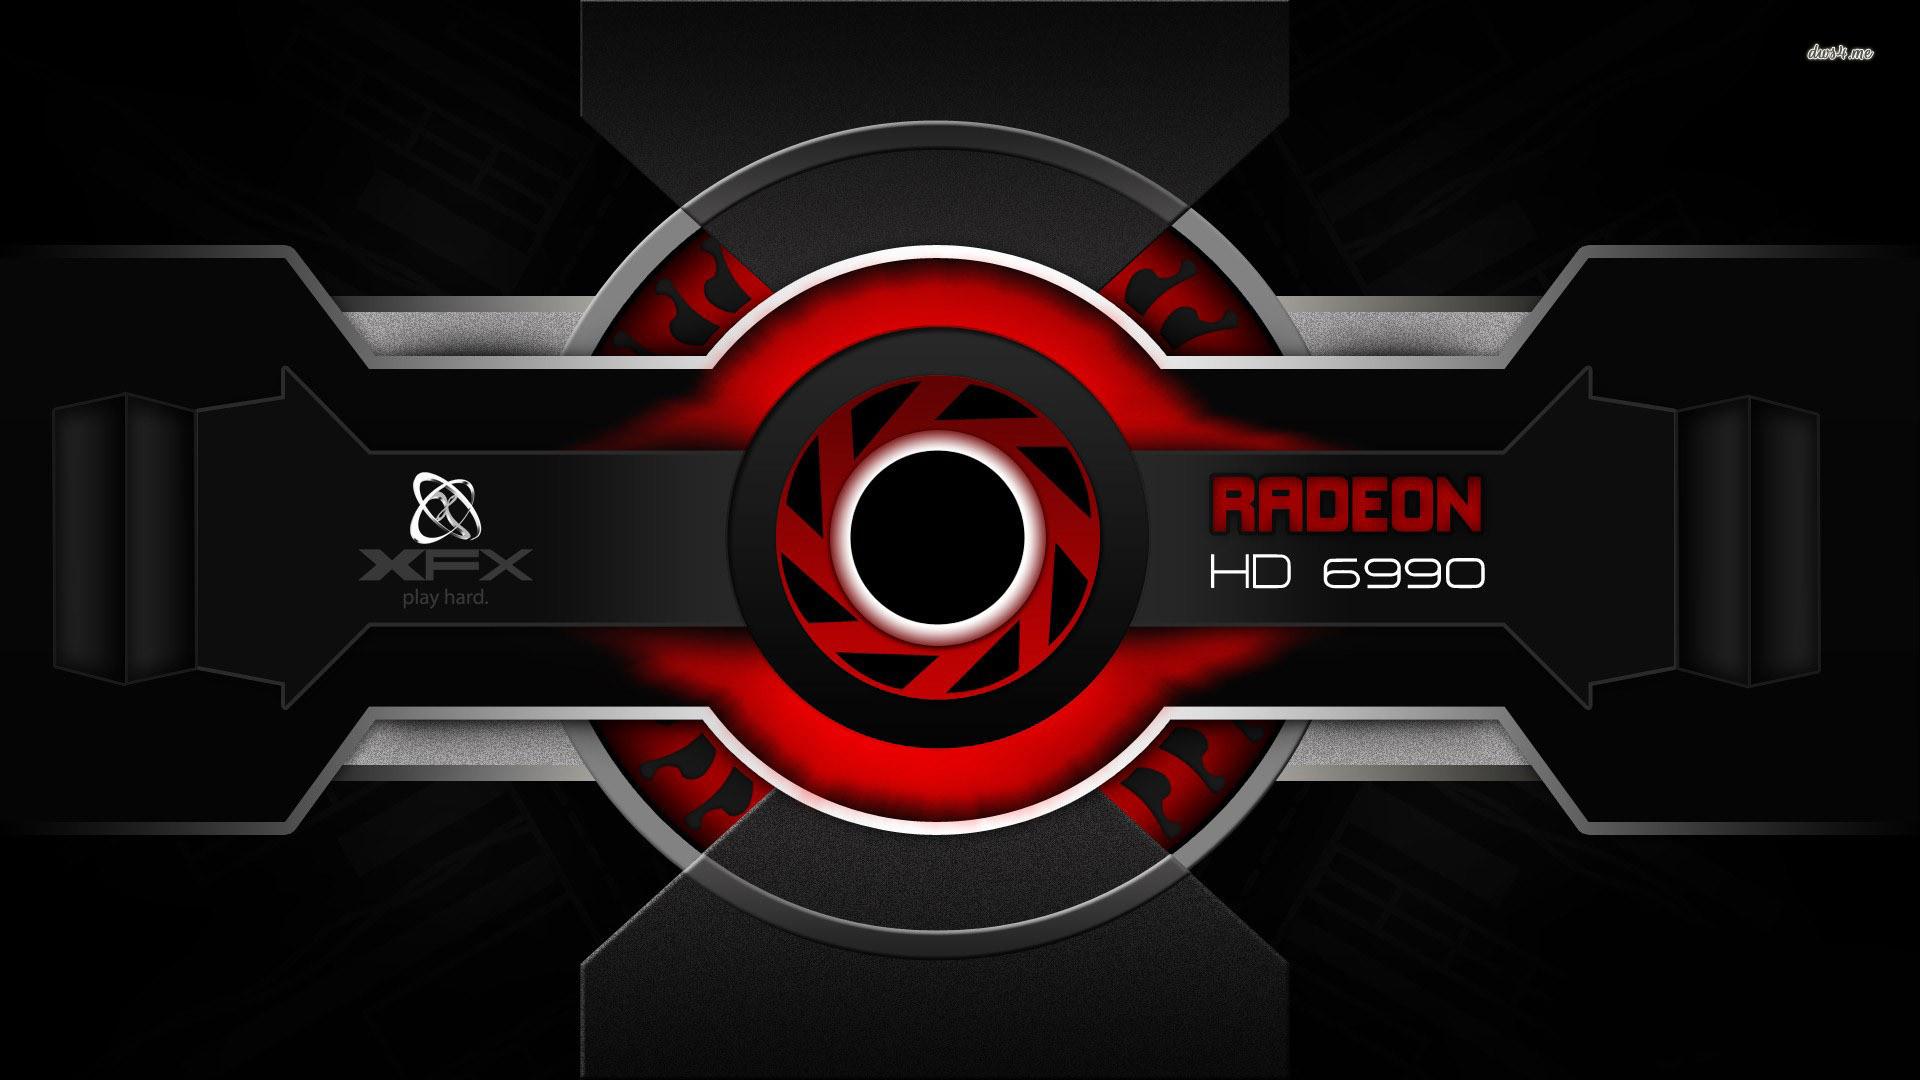 AMD Radeon wallpaper 1280×800 AMD Radeon wallpaper 1366×768 AMD Radeon .